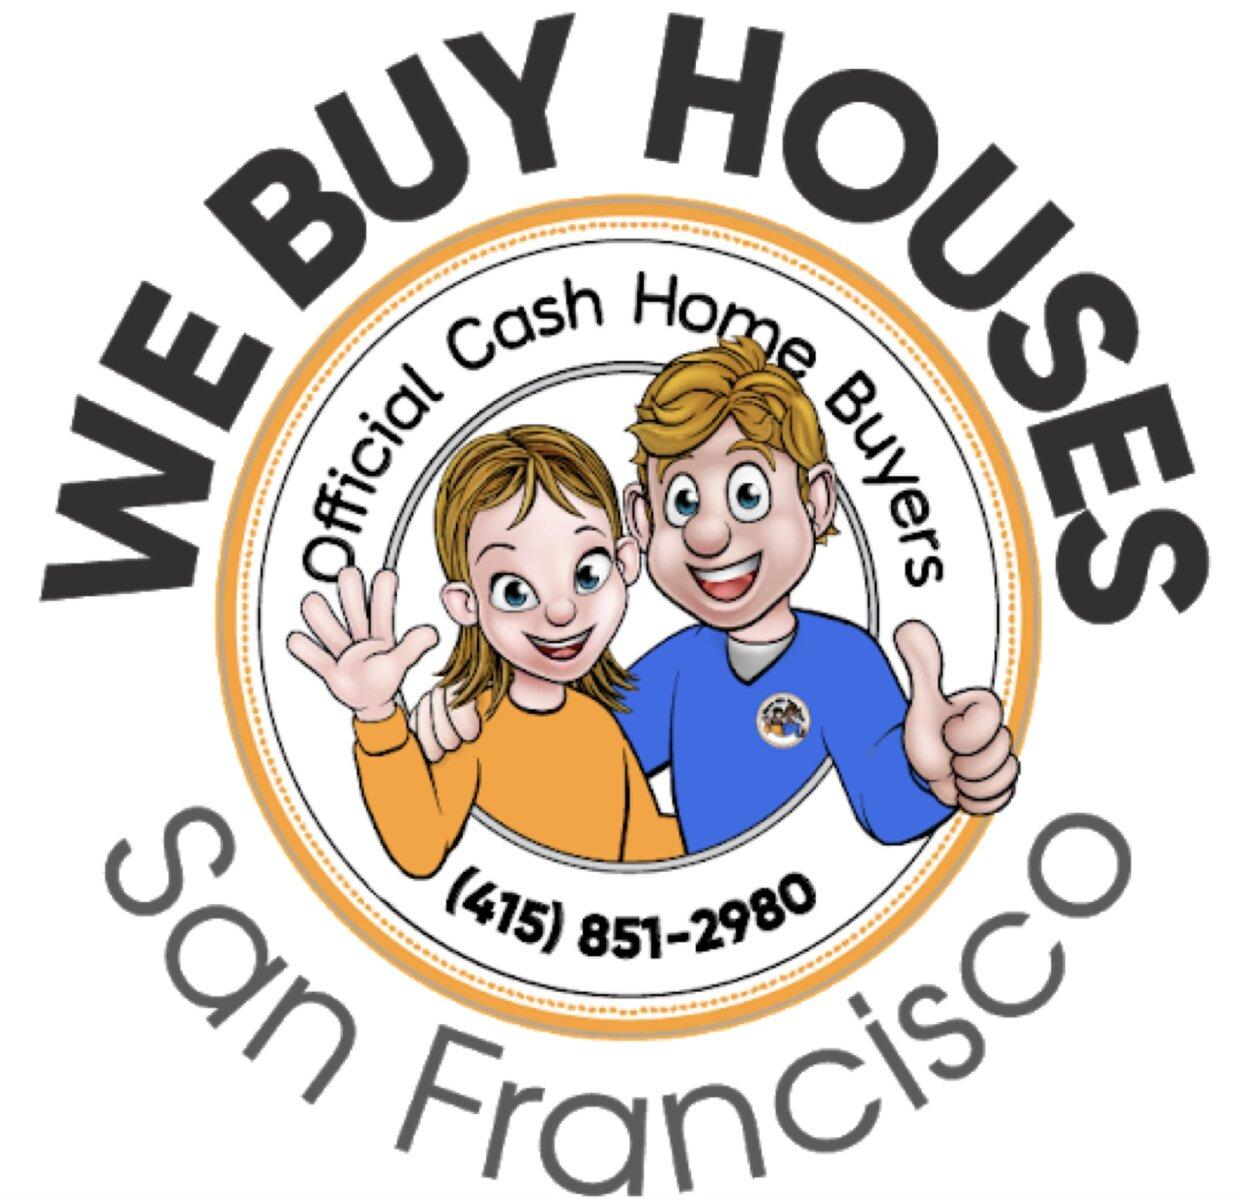 We Buy Houses San Francisco logo